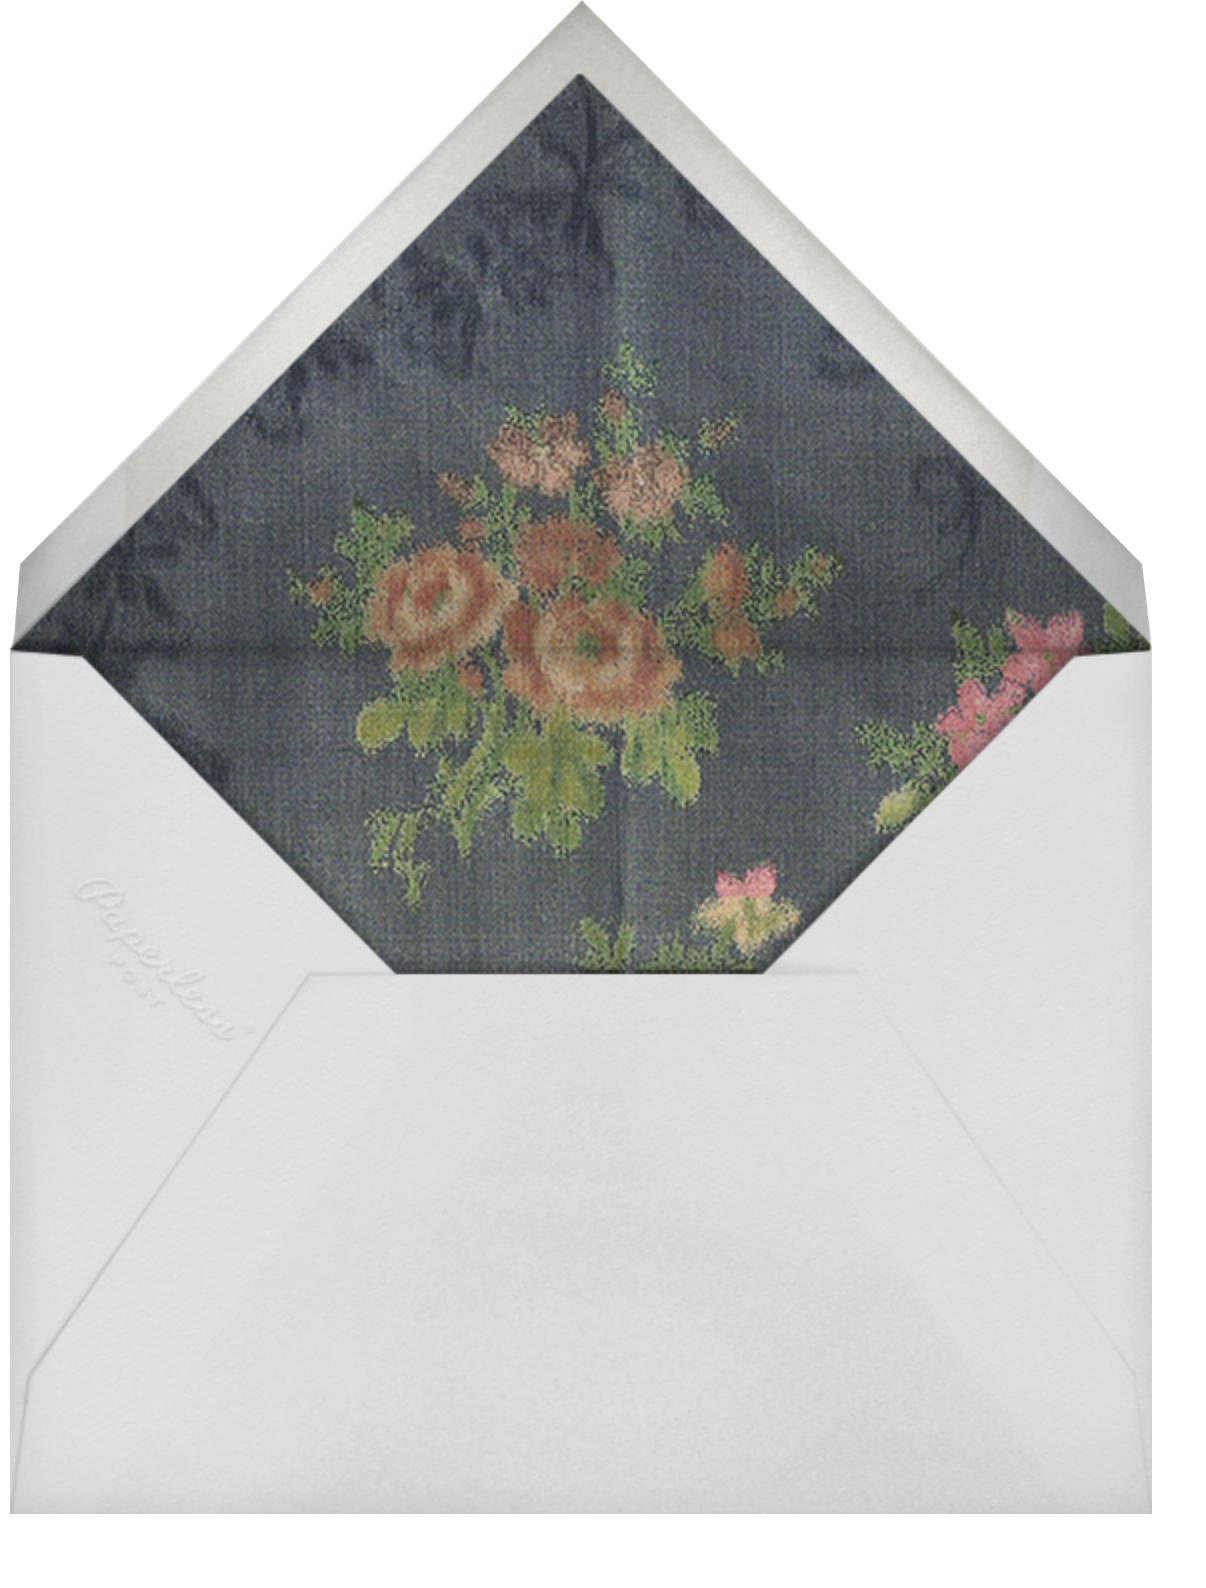 Tatyana Photo - Brock Collection - Christmas - envelope back